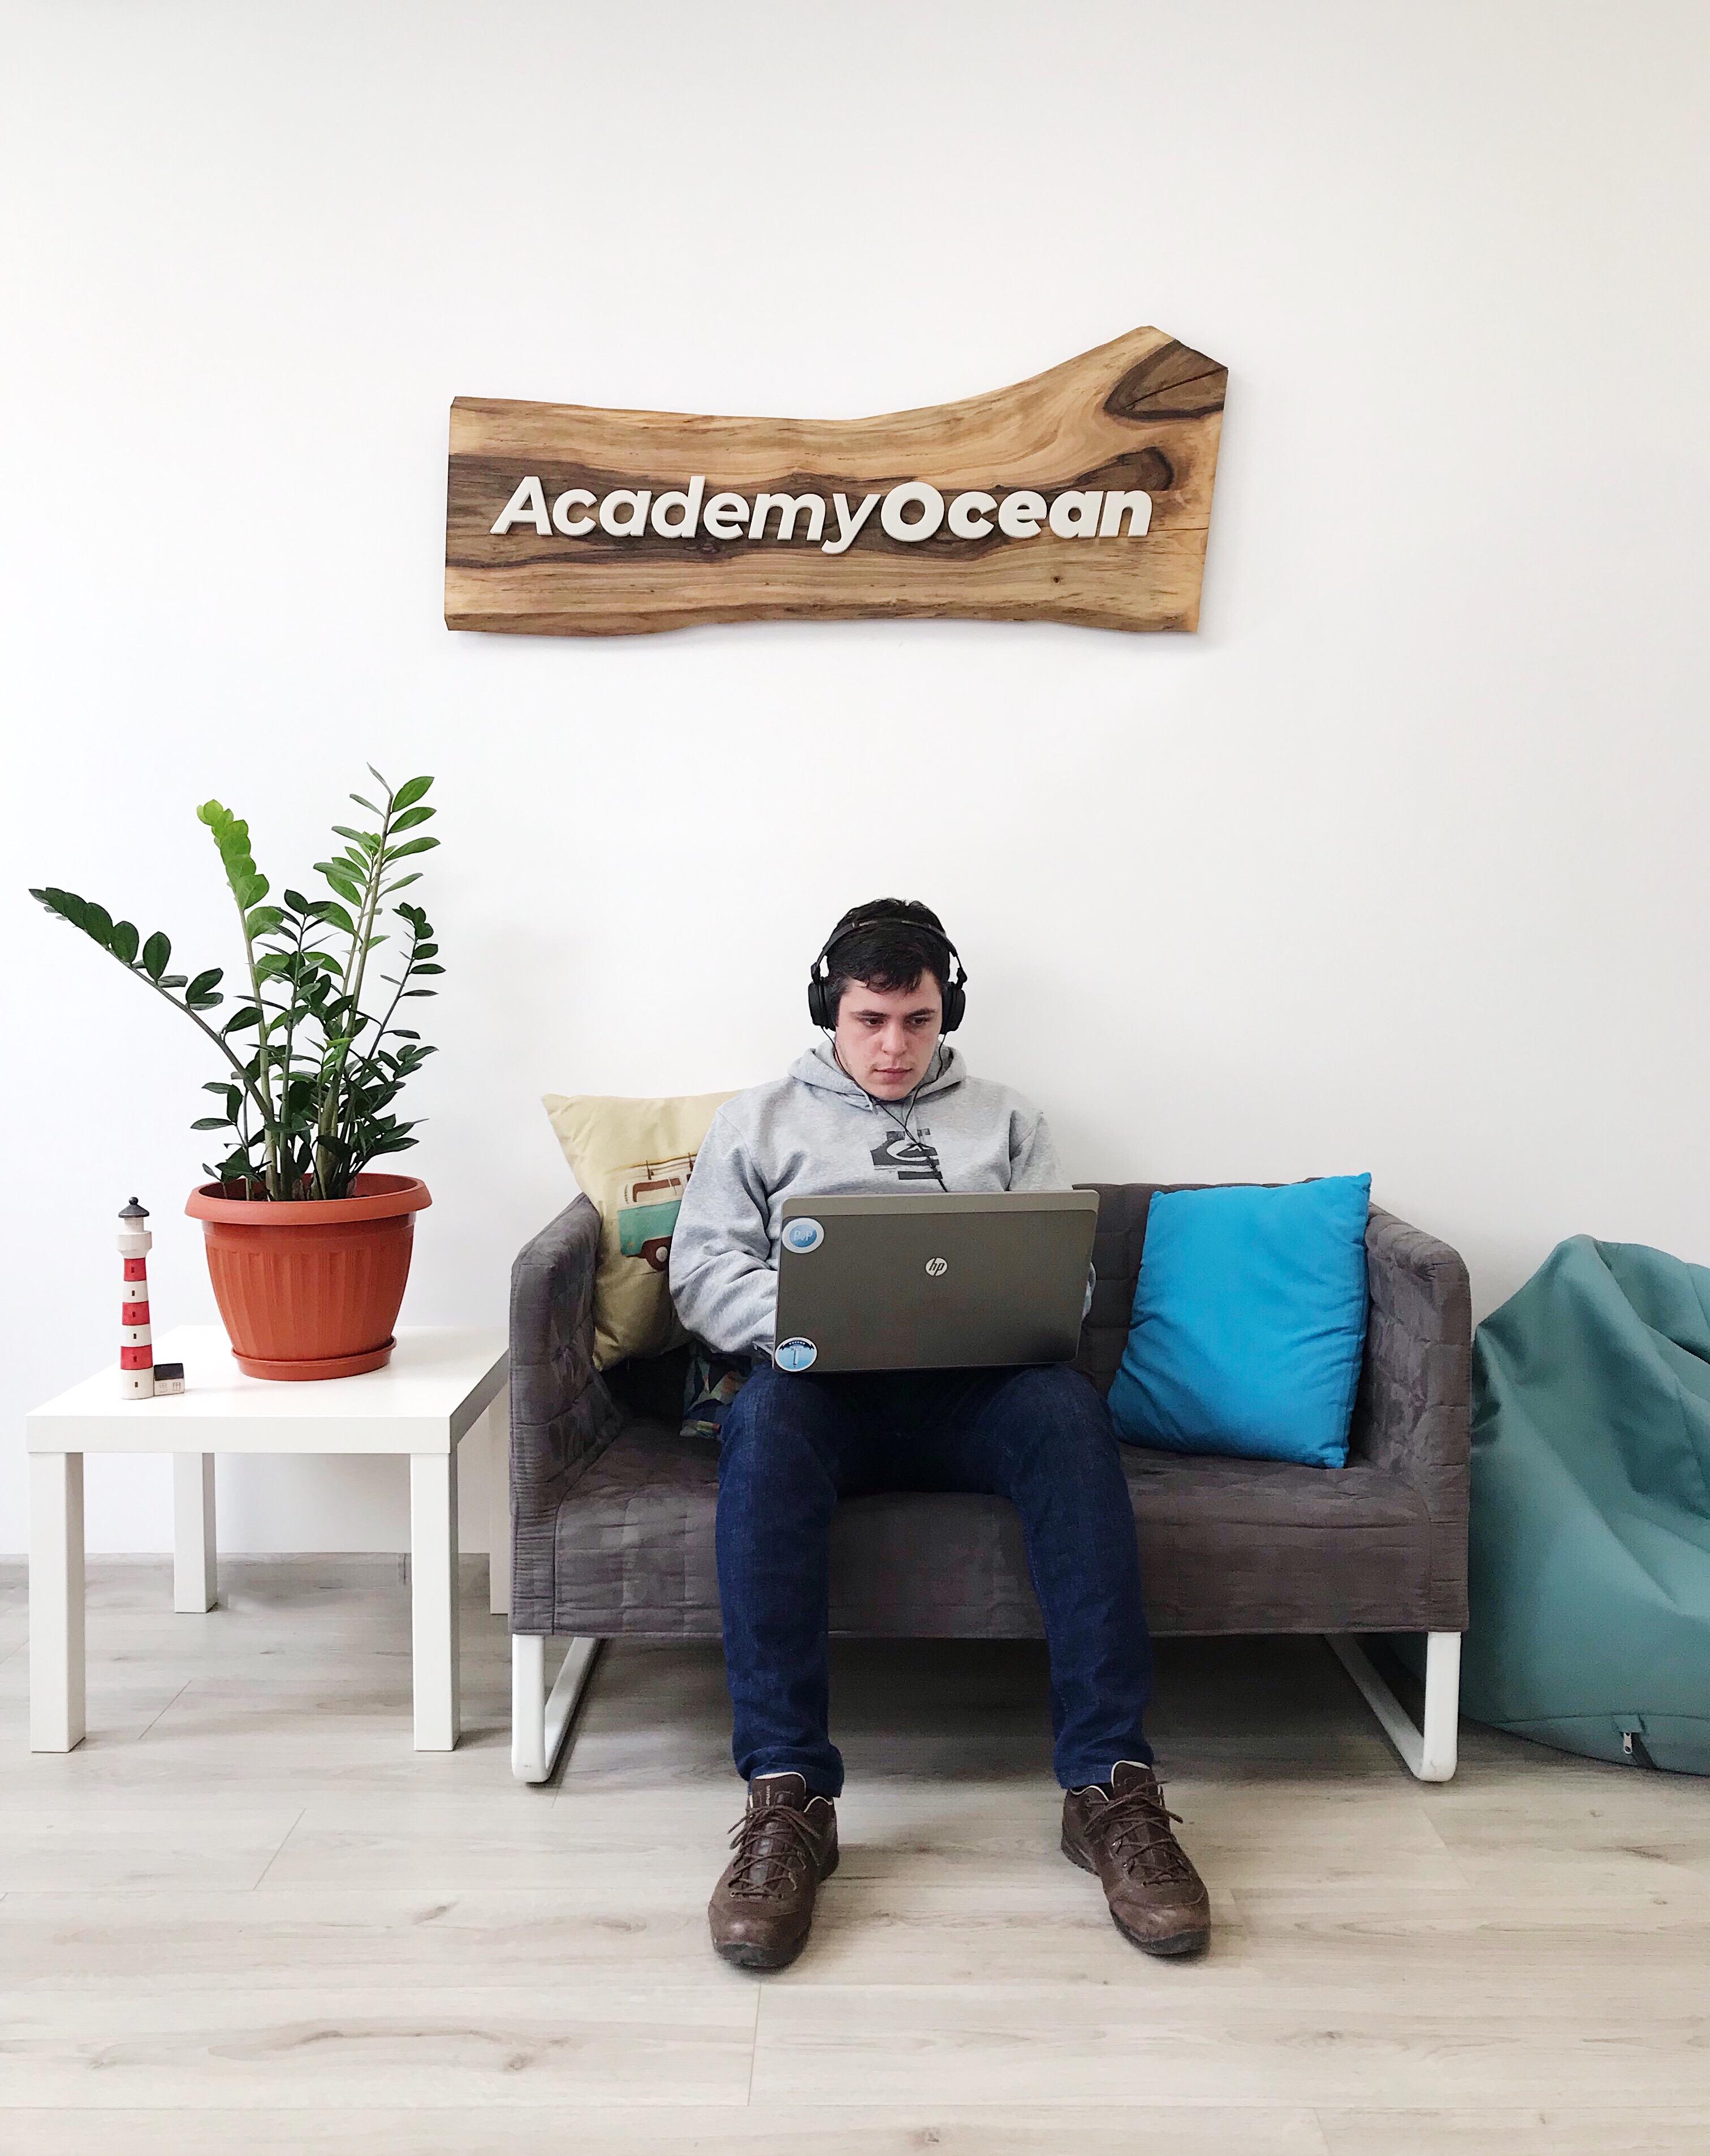 AcademyOcean office